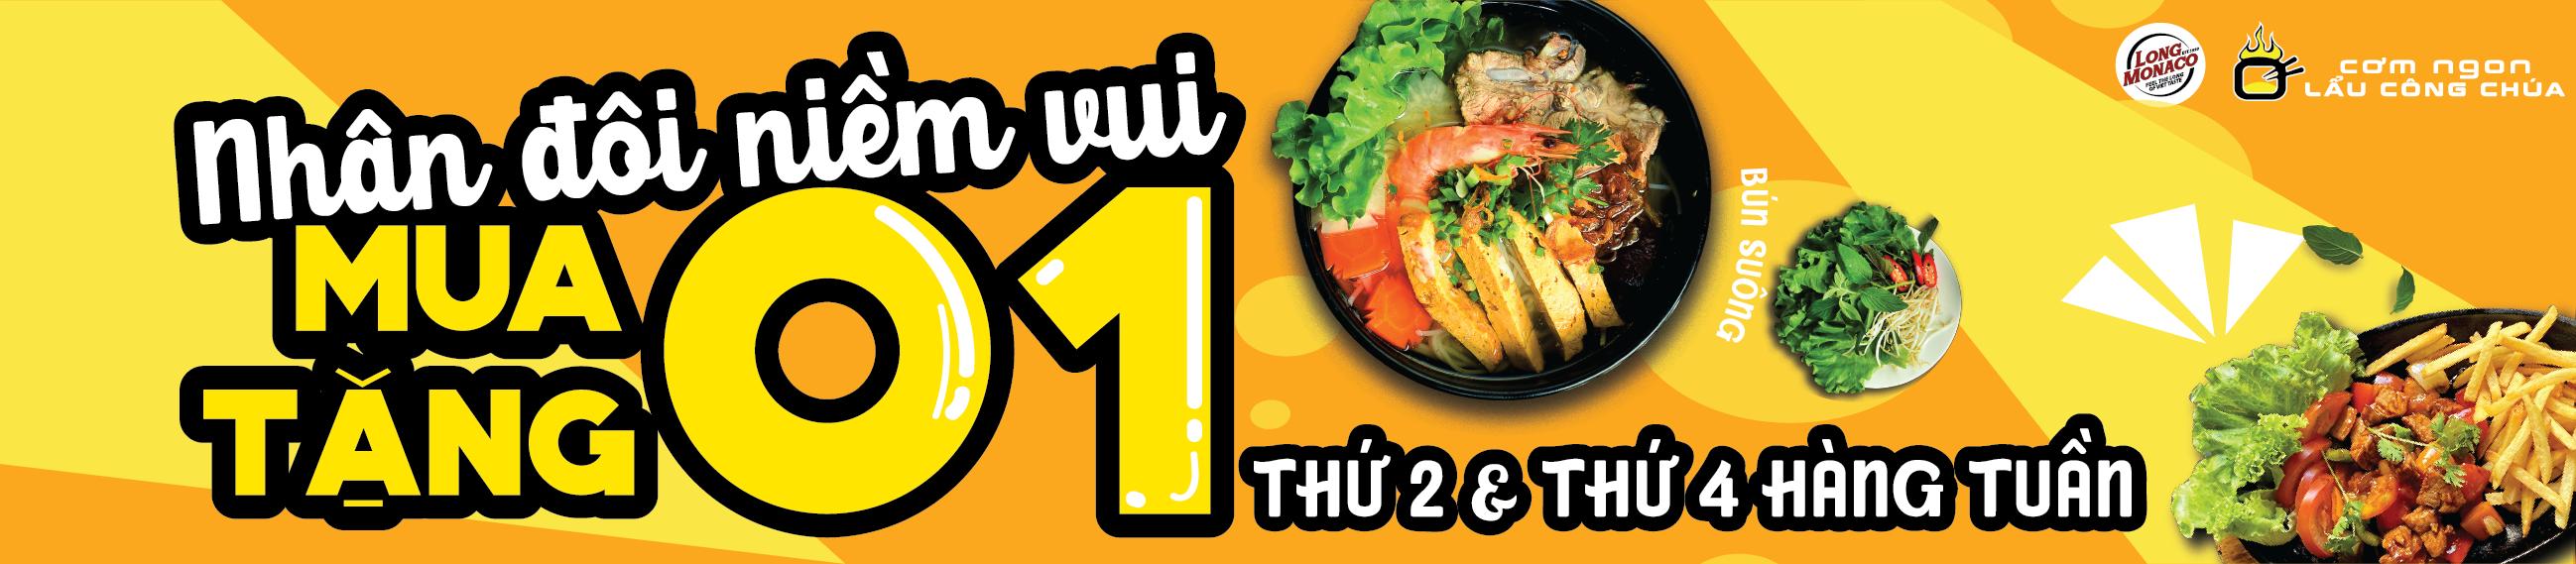 Ăn 1 tặng 1 - Deal siêu hot, menu siêu mới